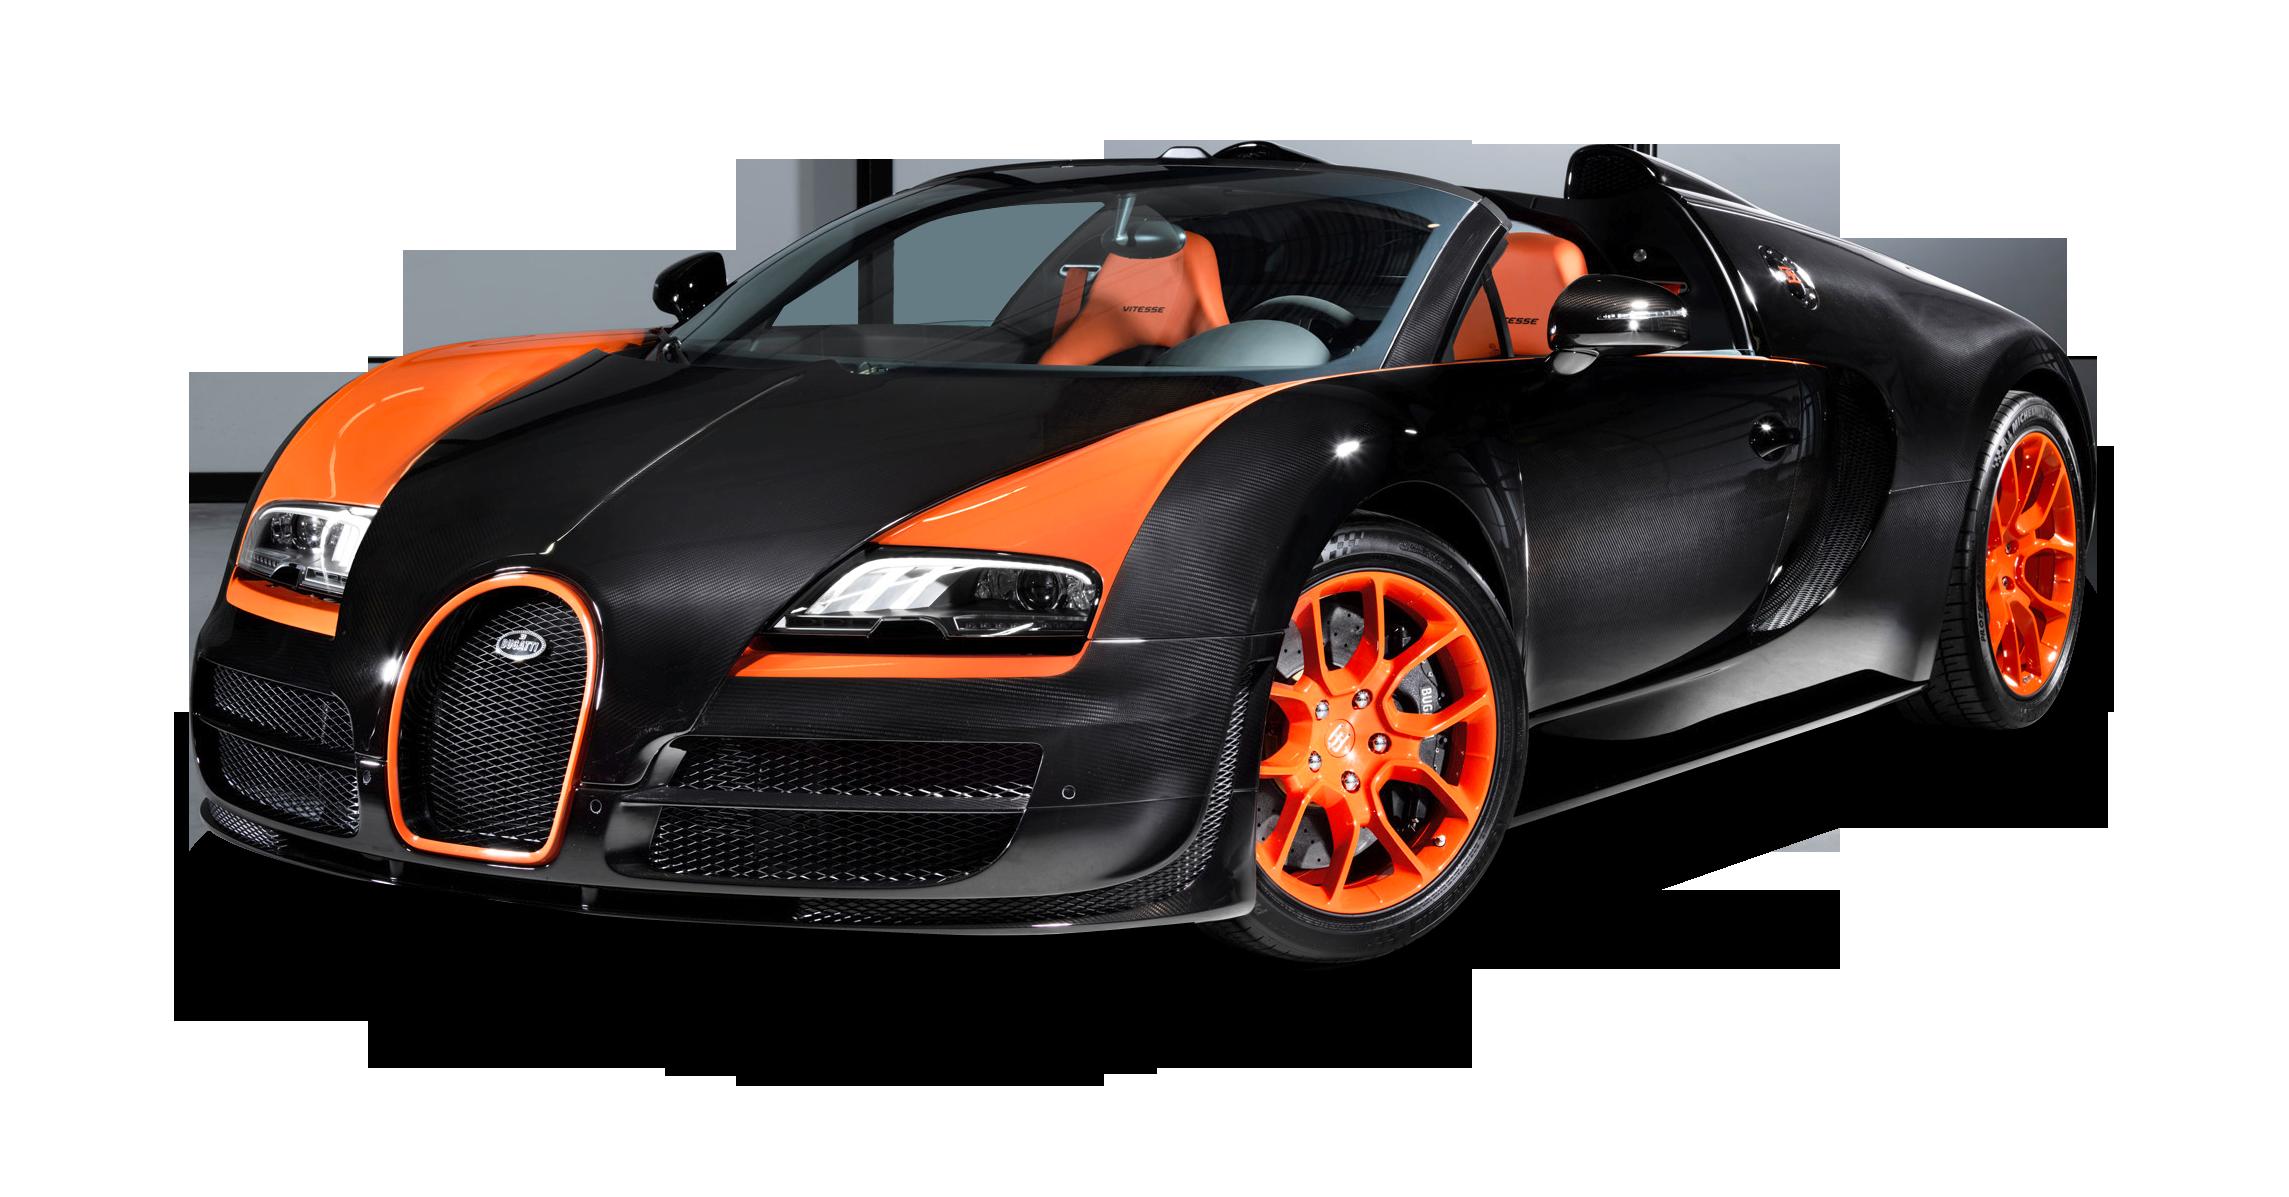 Bugatti Veyron 16 4 Grand Sport Vitesse Car Png Image Bugatti Veyron Bugatti Car Png